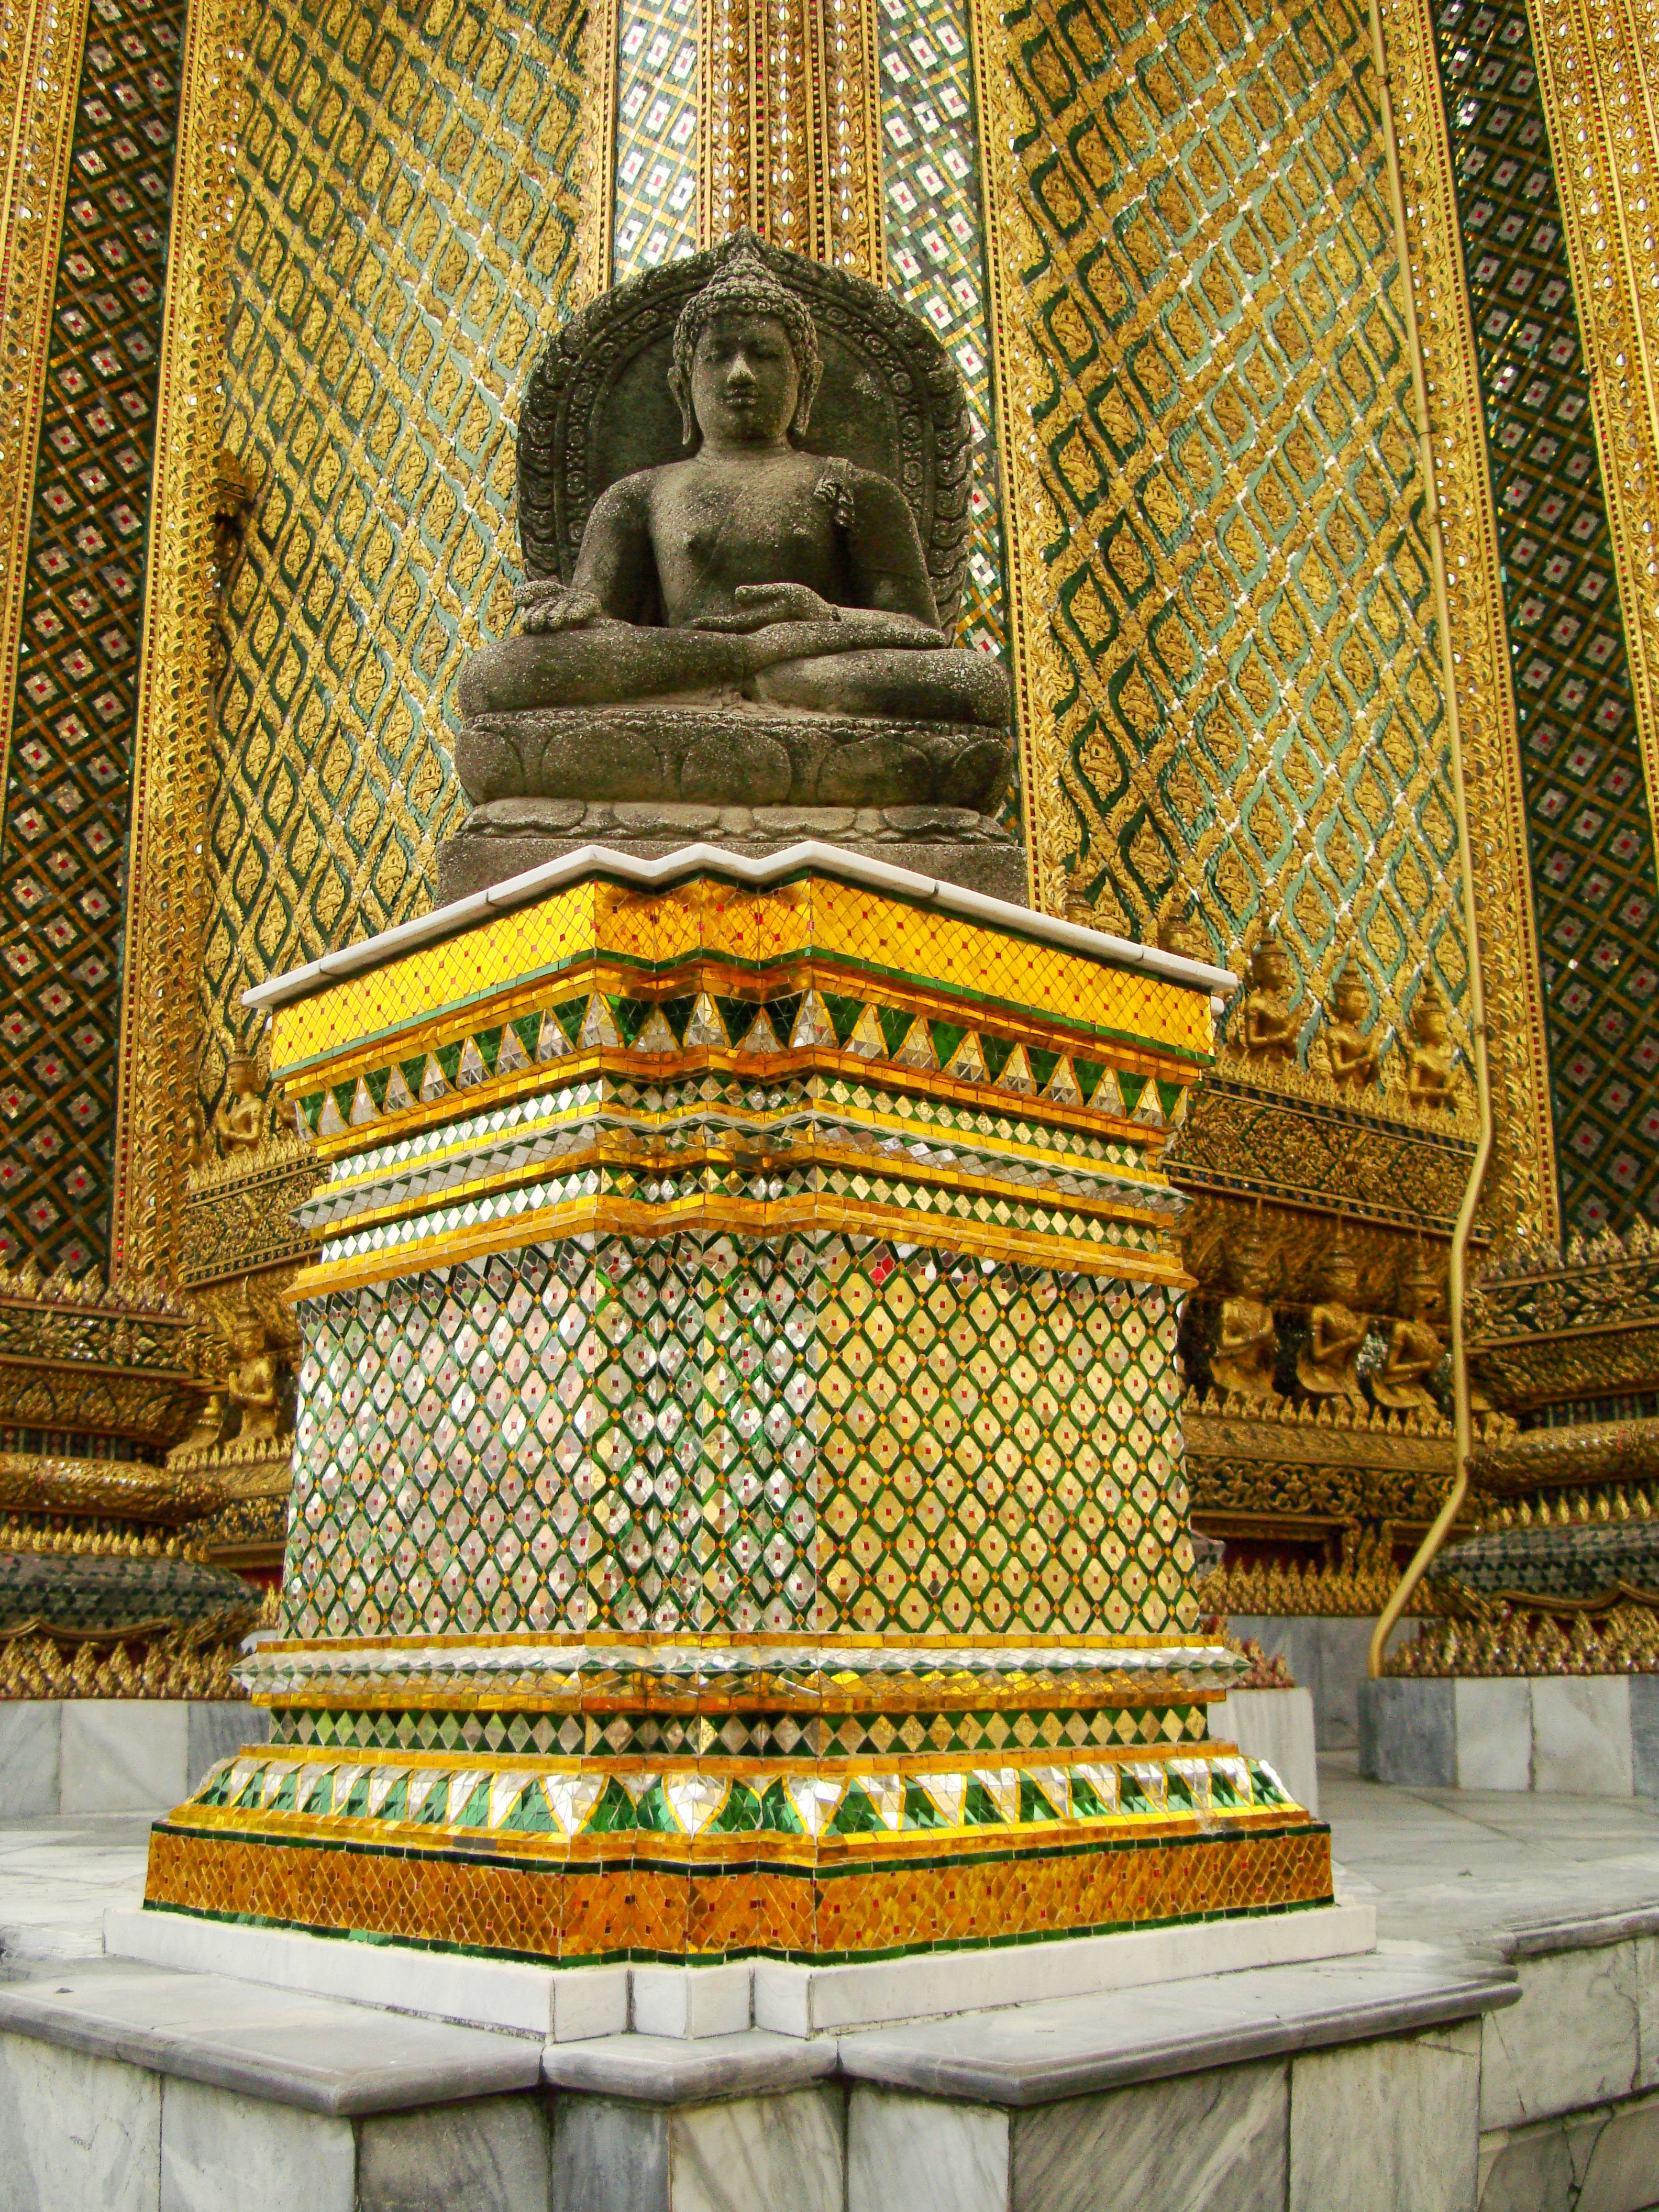 07 Phra Mondop intercrit designed walls and pillars Grand Palace 2010 06